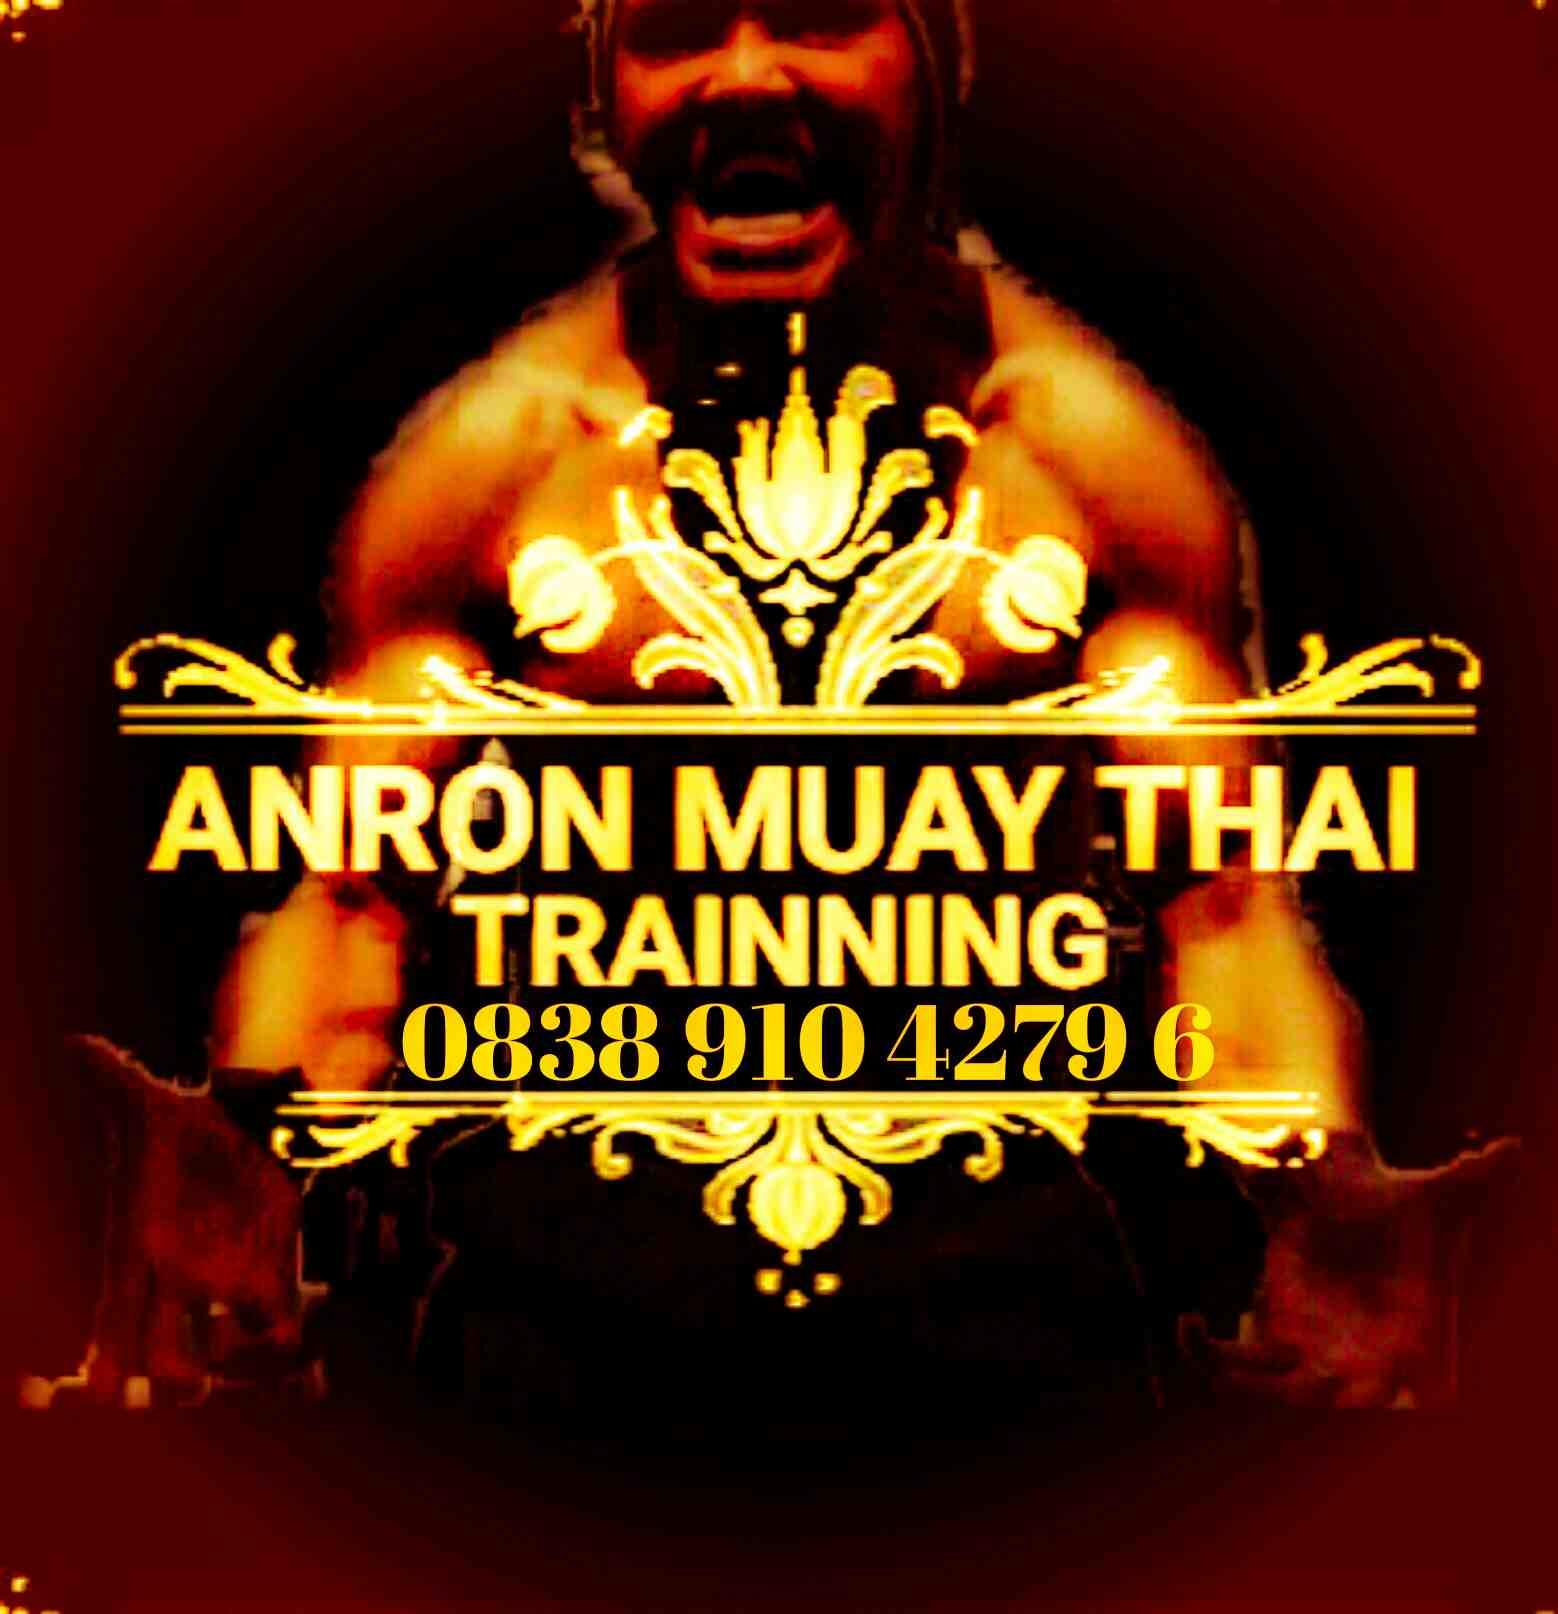 Foto: Anron Muay Thai Trainning